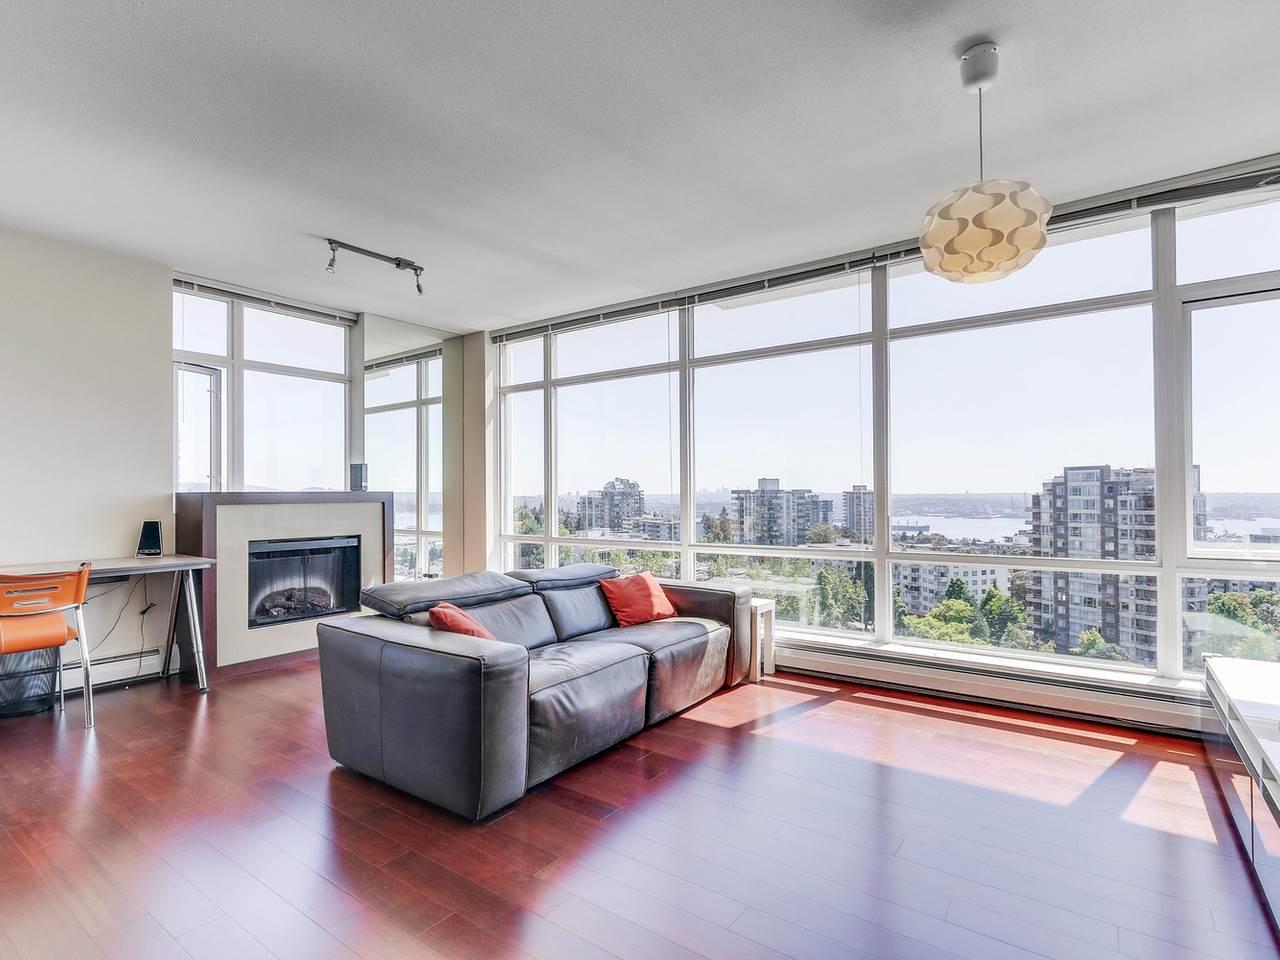 Condo Apartment at 1201 1320 CHESTERFIELD AVENUE, Unit 1201, North Vancouver, British Columbia. Image 6